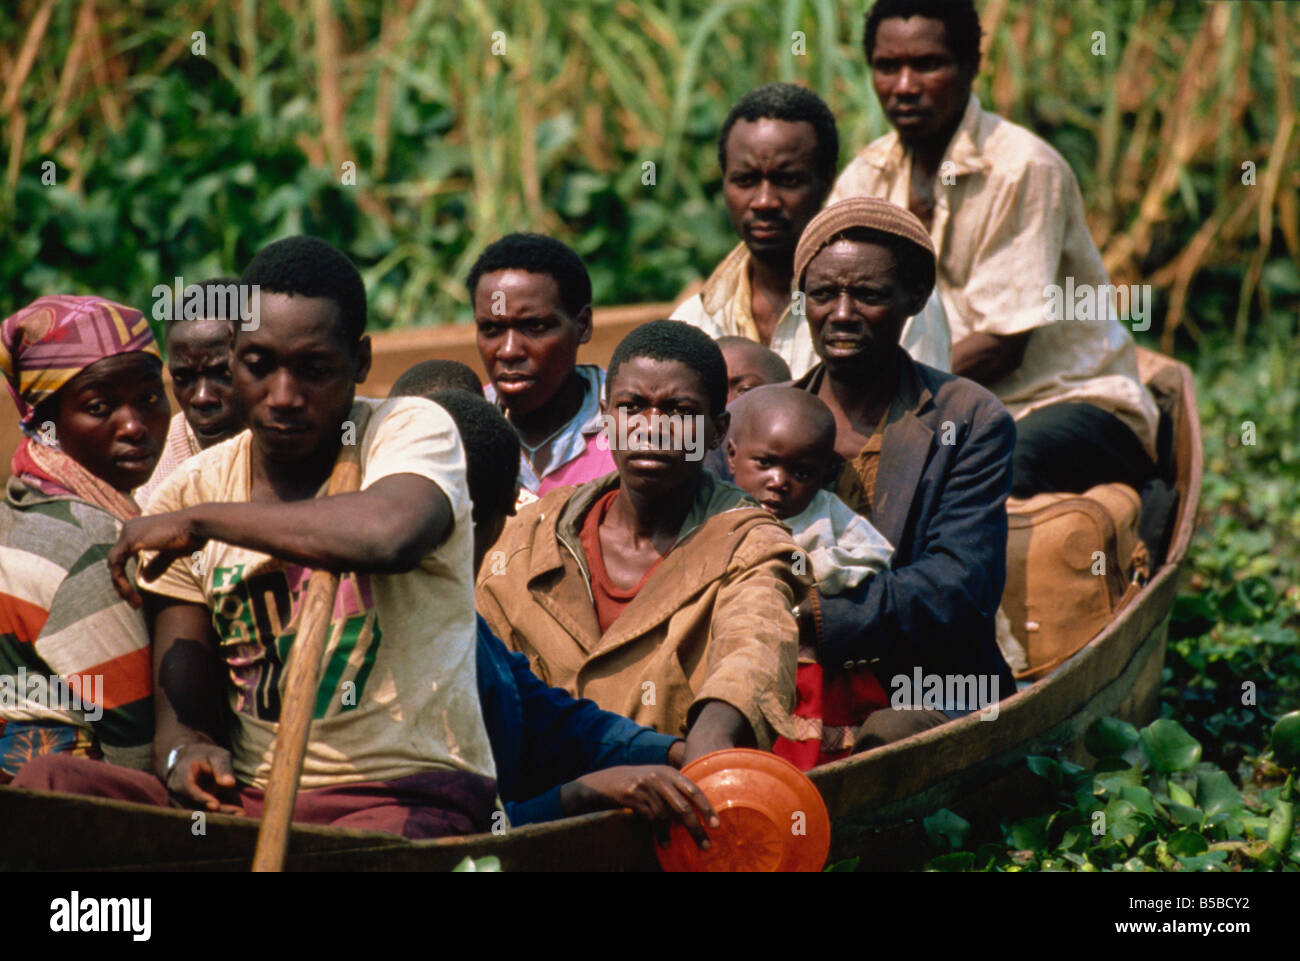 Refugees cross river from Rwanda in July 1994, Kagenyi Camp, Karagwe, Tanzania, East Africa, Africa - Stock Image